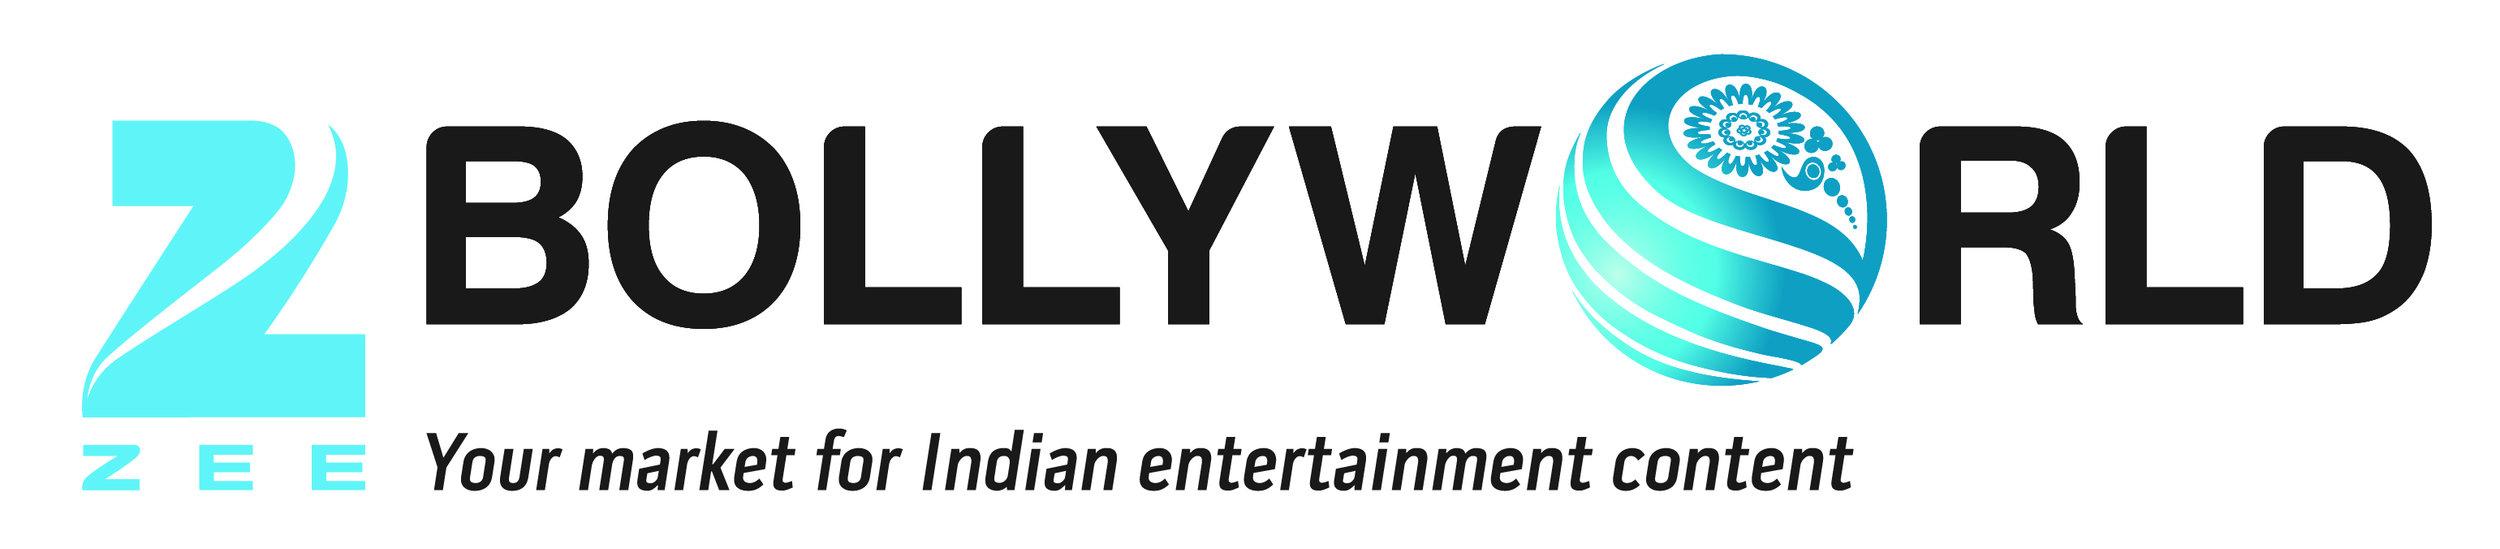 zee bollyworld final logo.jpg